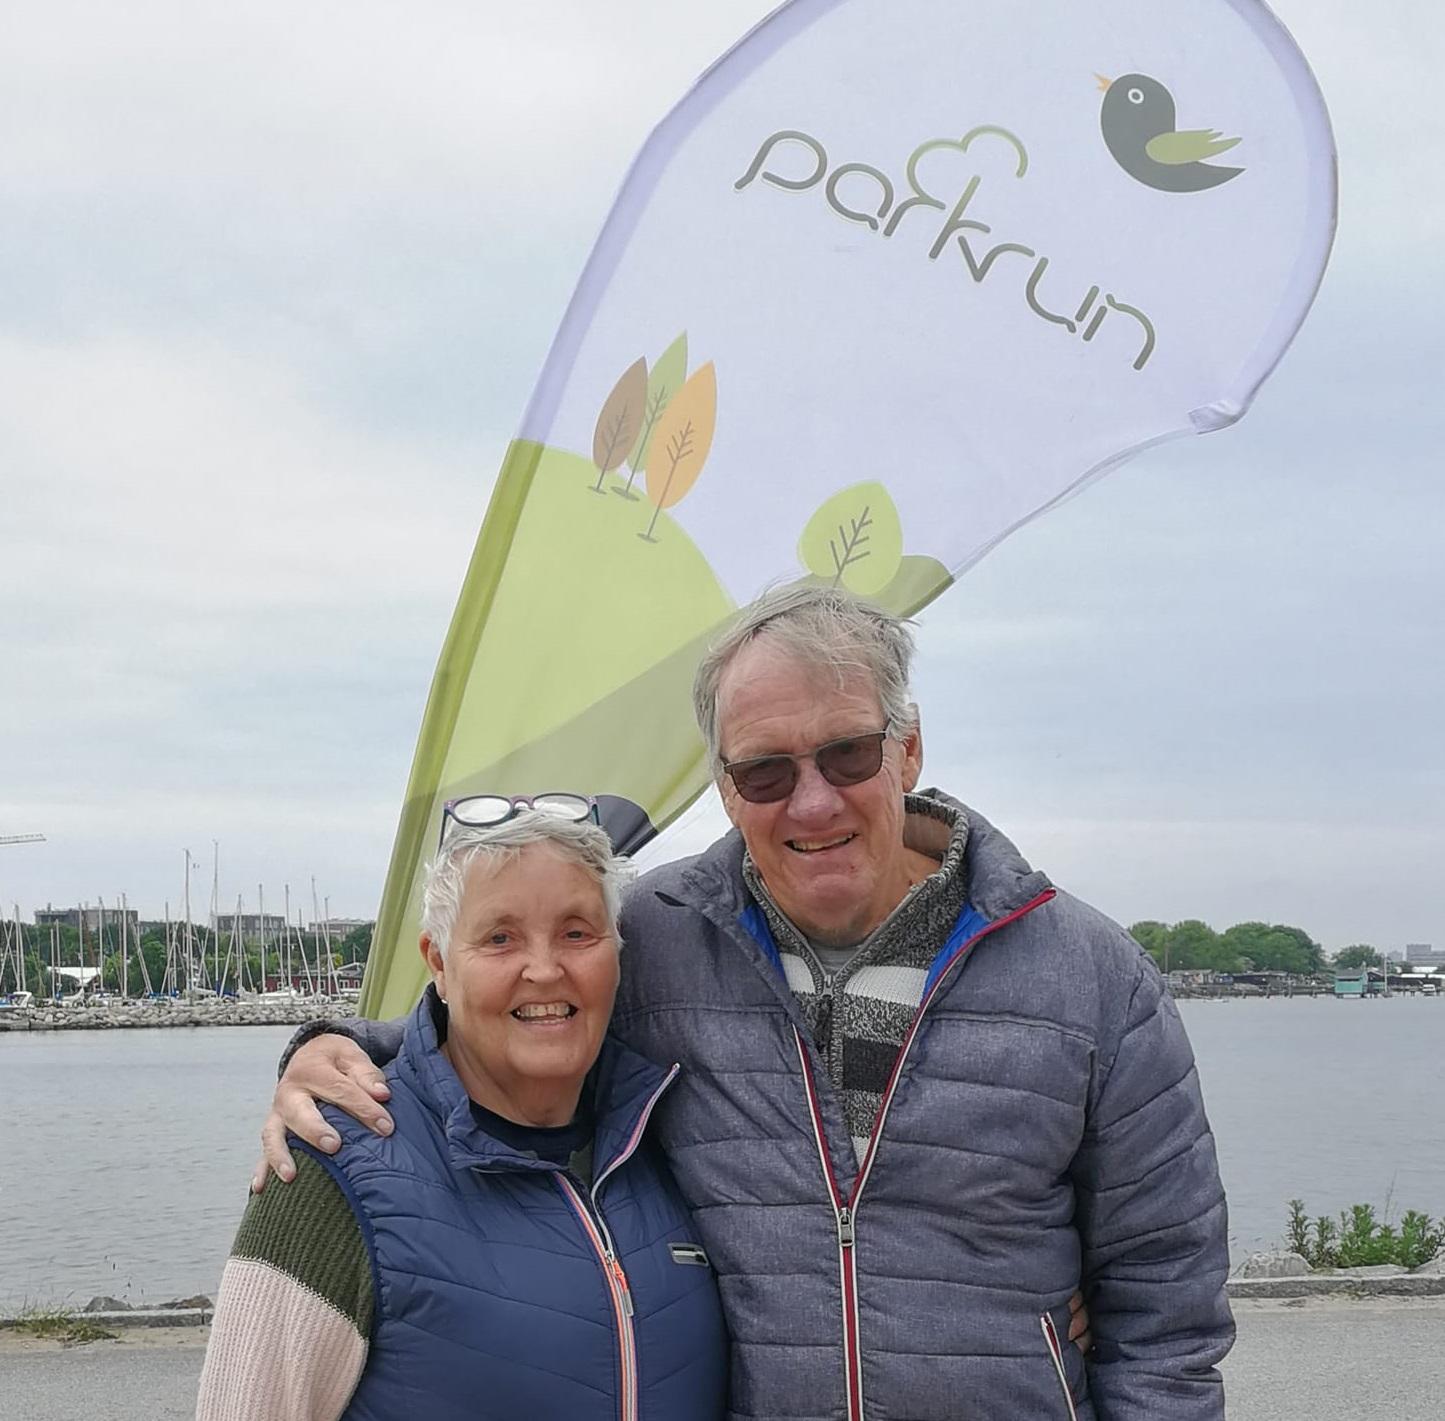 Steen_Grethe_parkrun_beach_flag (002) article